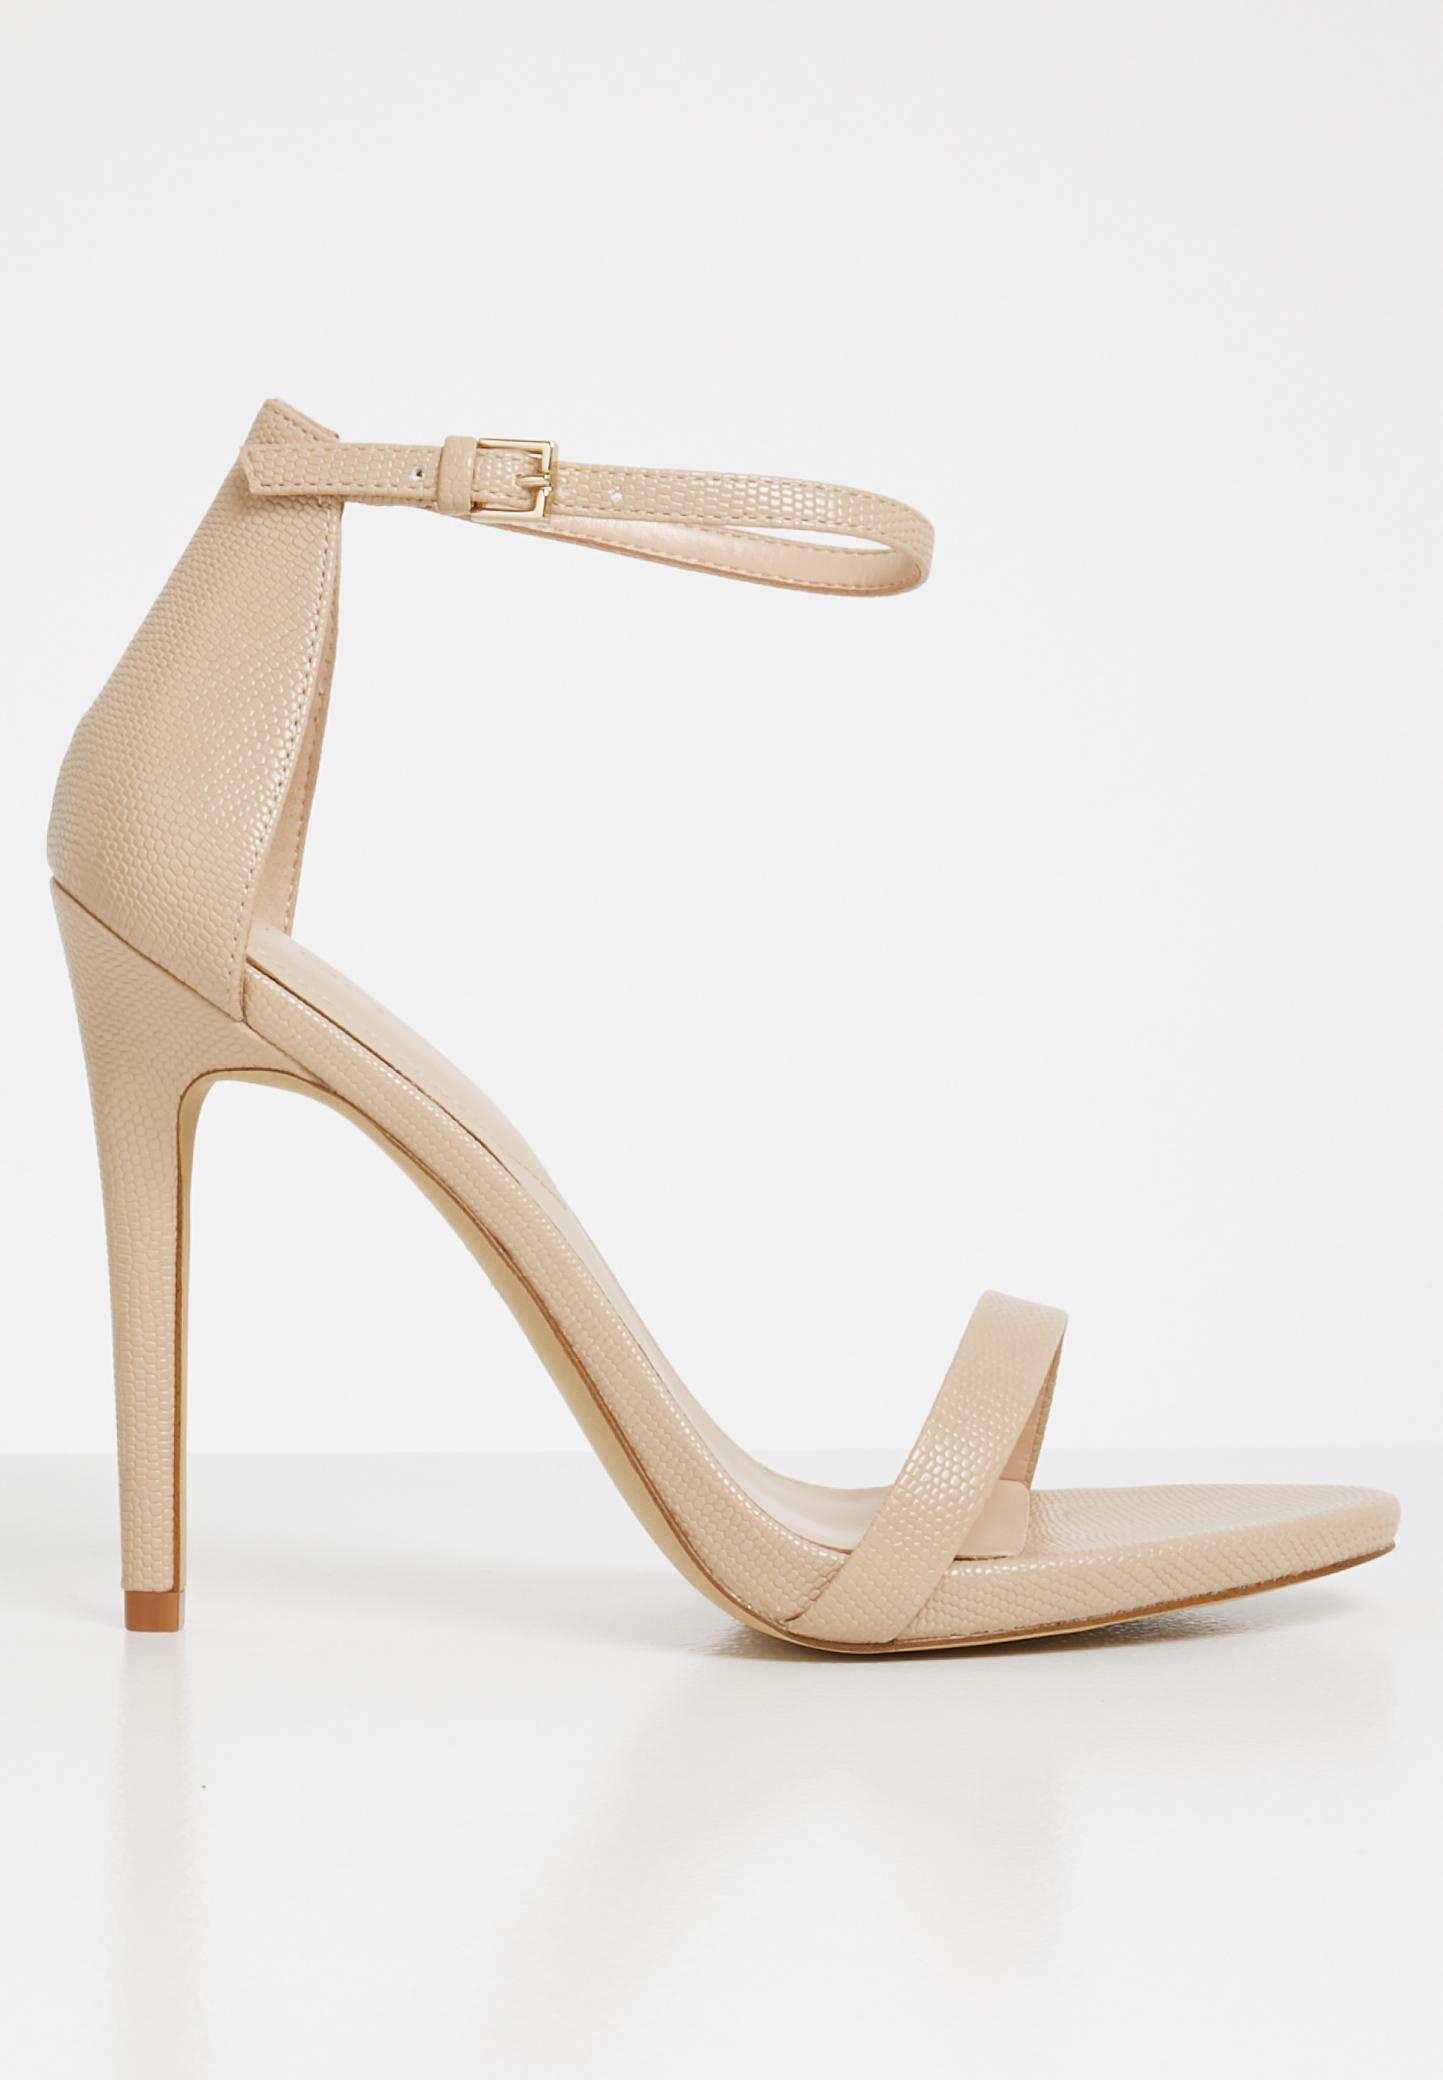 96757ae4a41 Caraa ankle strap stiletto heel sandal - neutral ALDO Heels ...